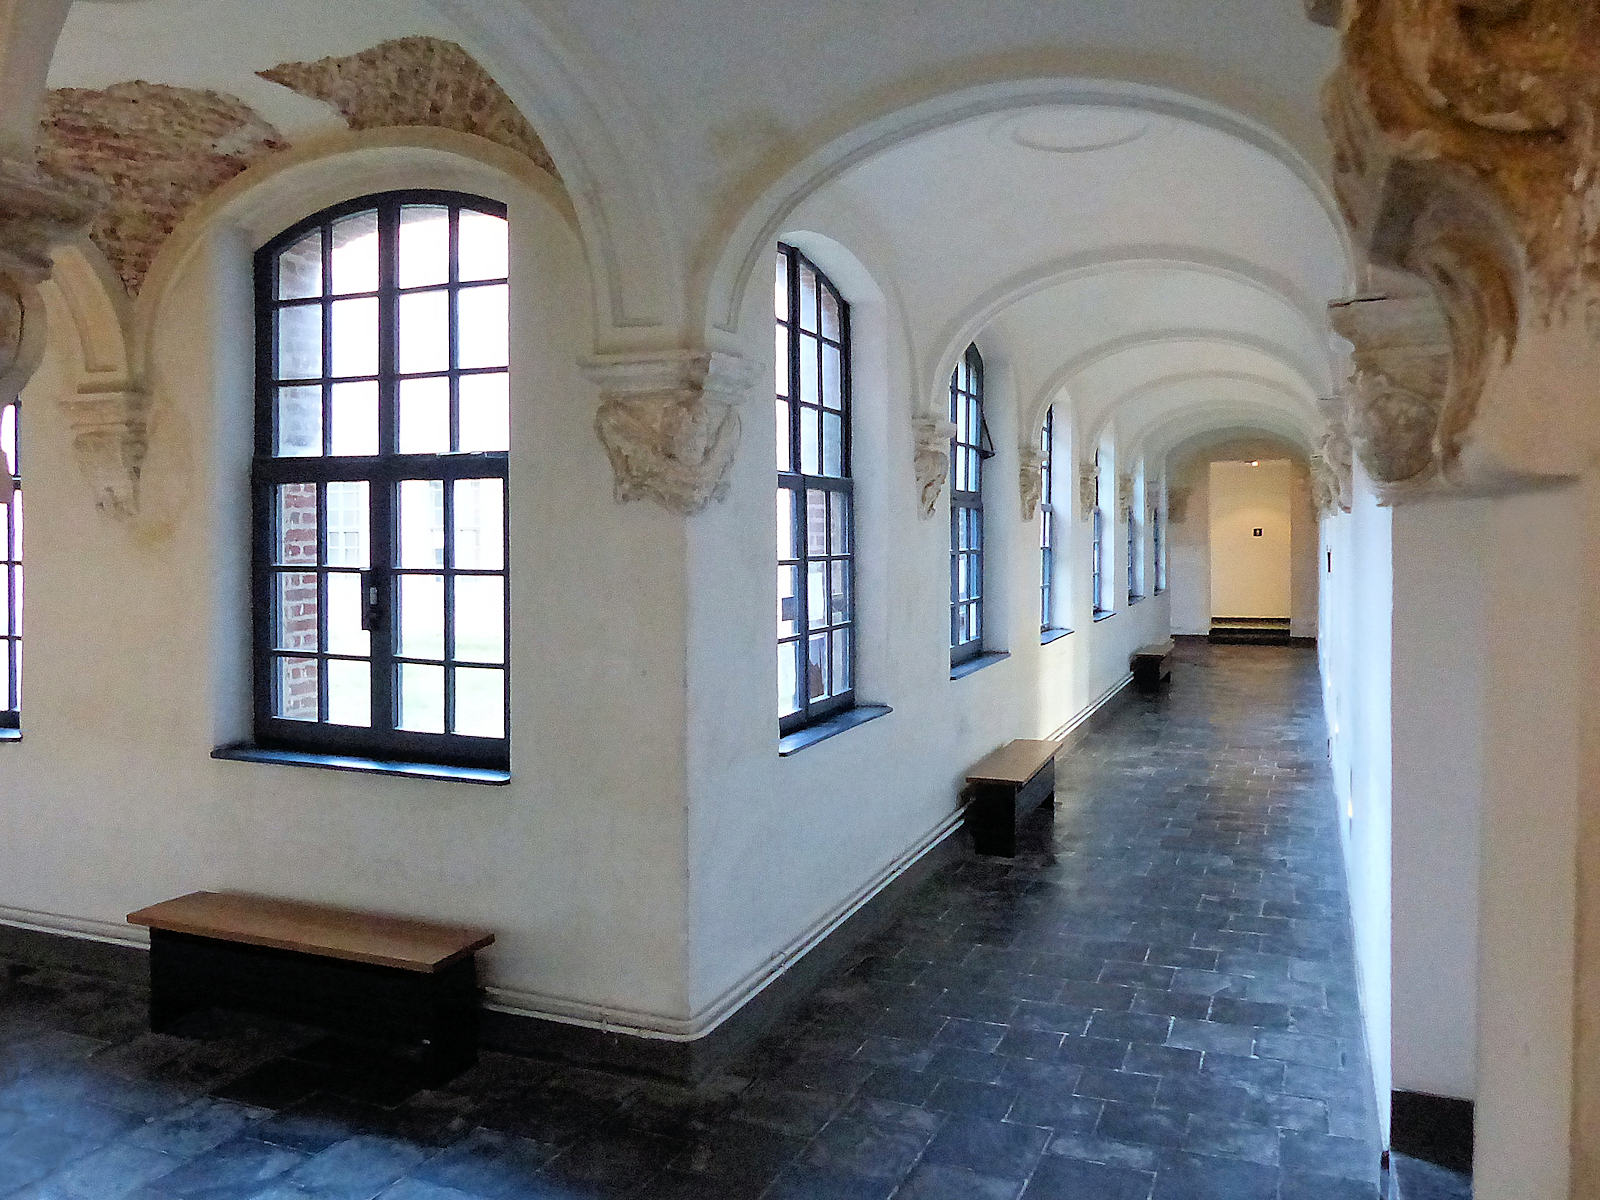 Galeries et culs-de-lampe